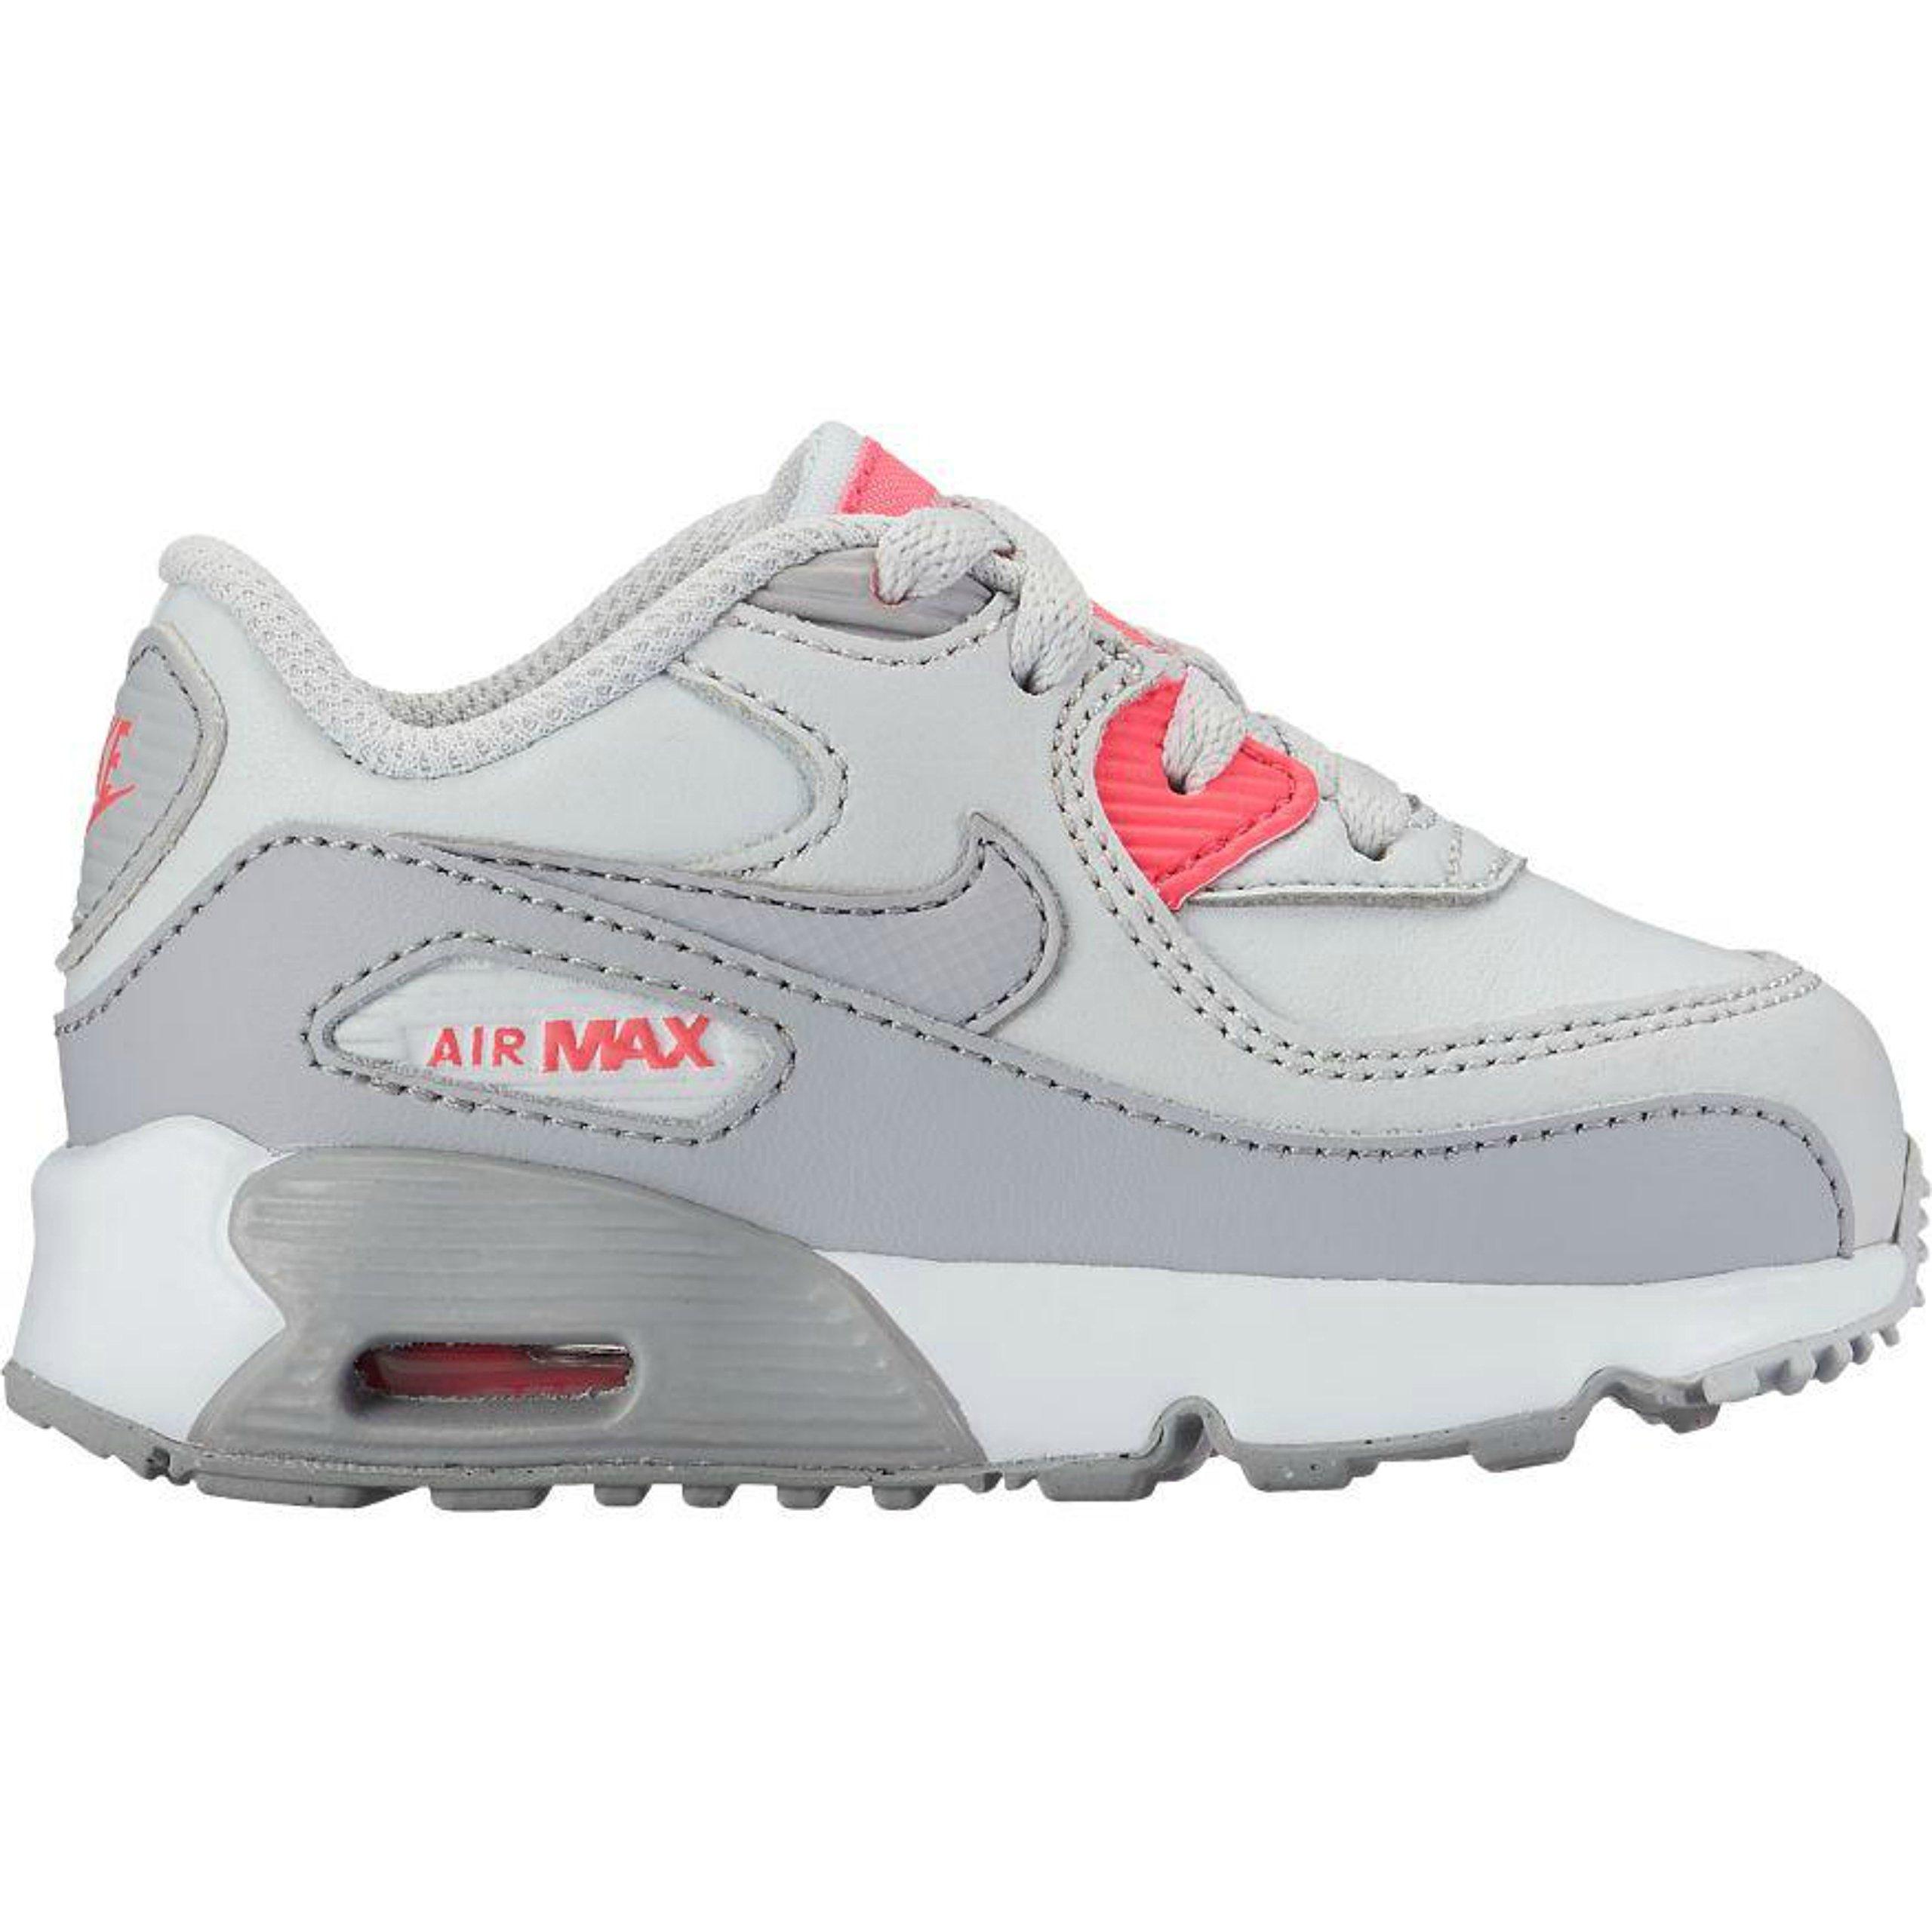 Nike Air max 90 LTR (TD) running shoes 833379 007 (8)